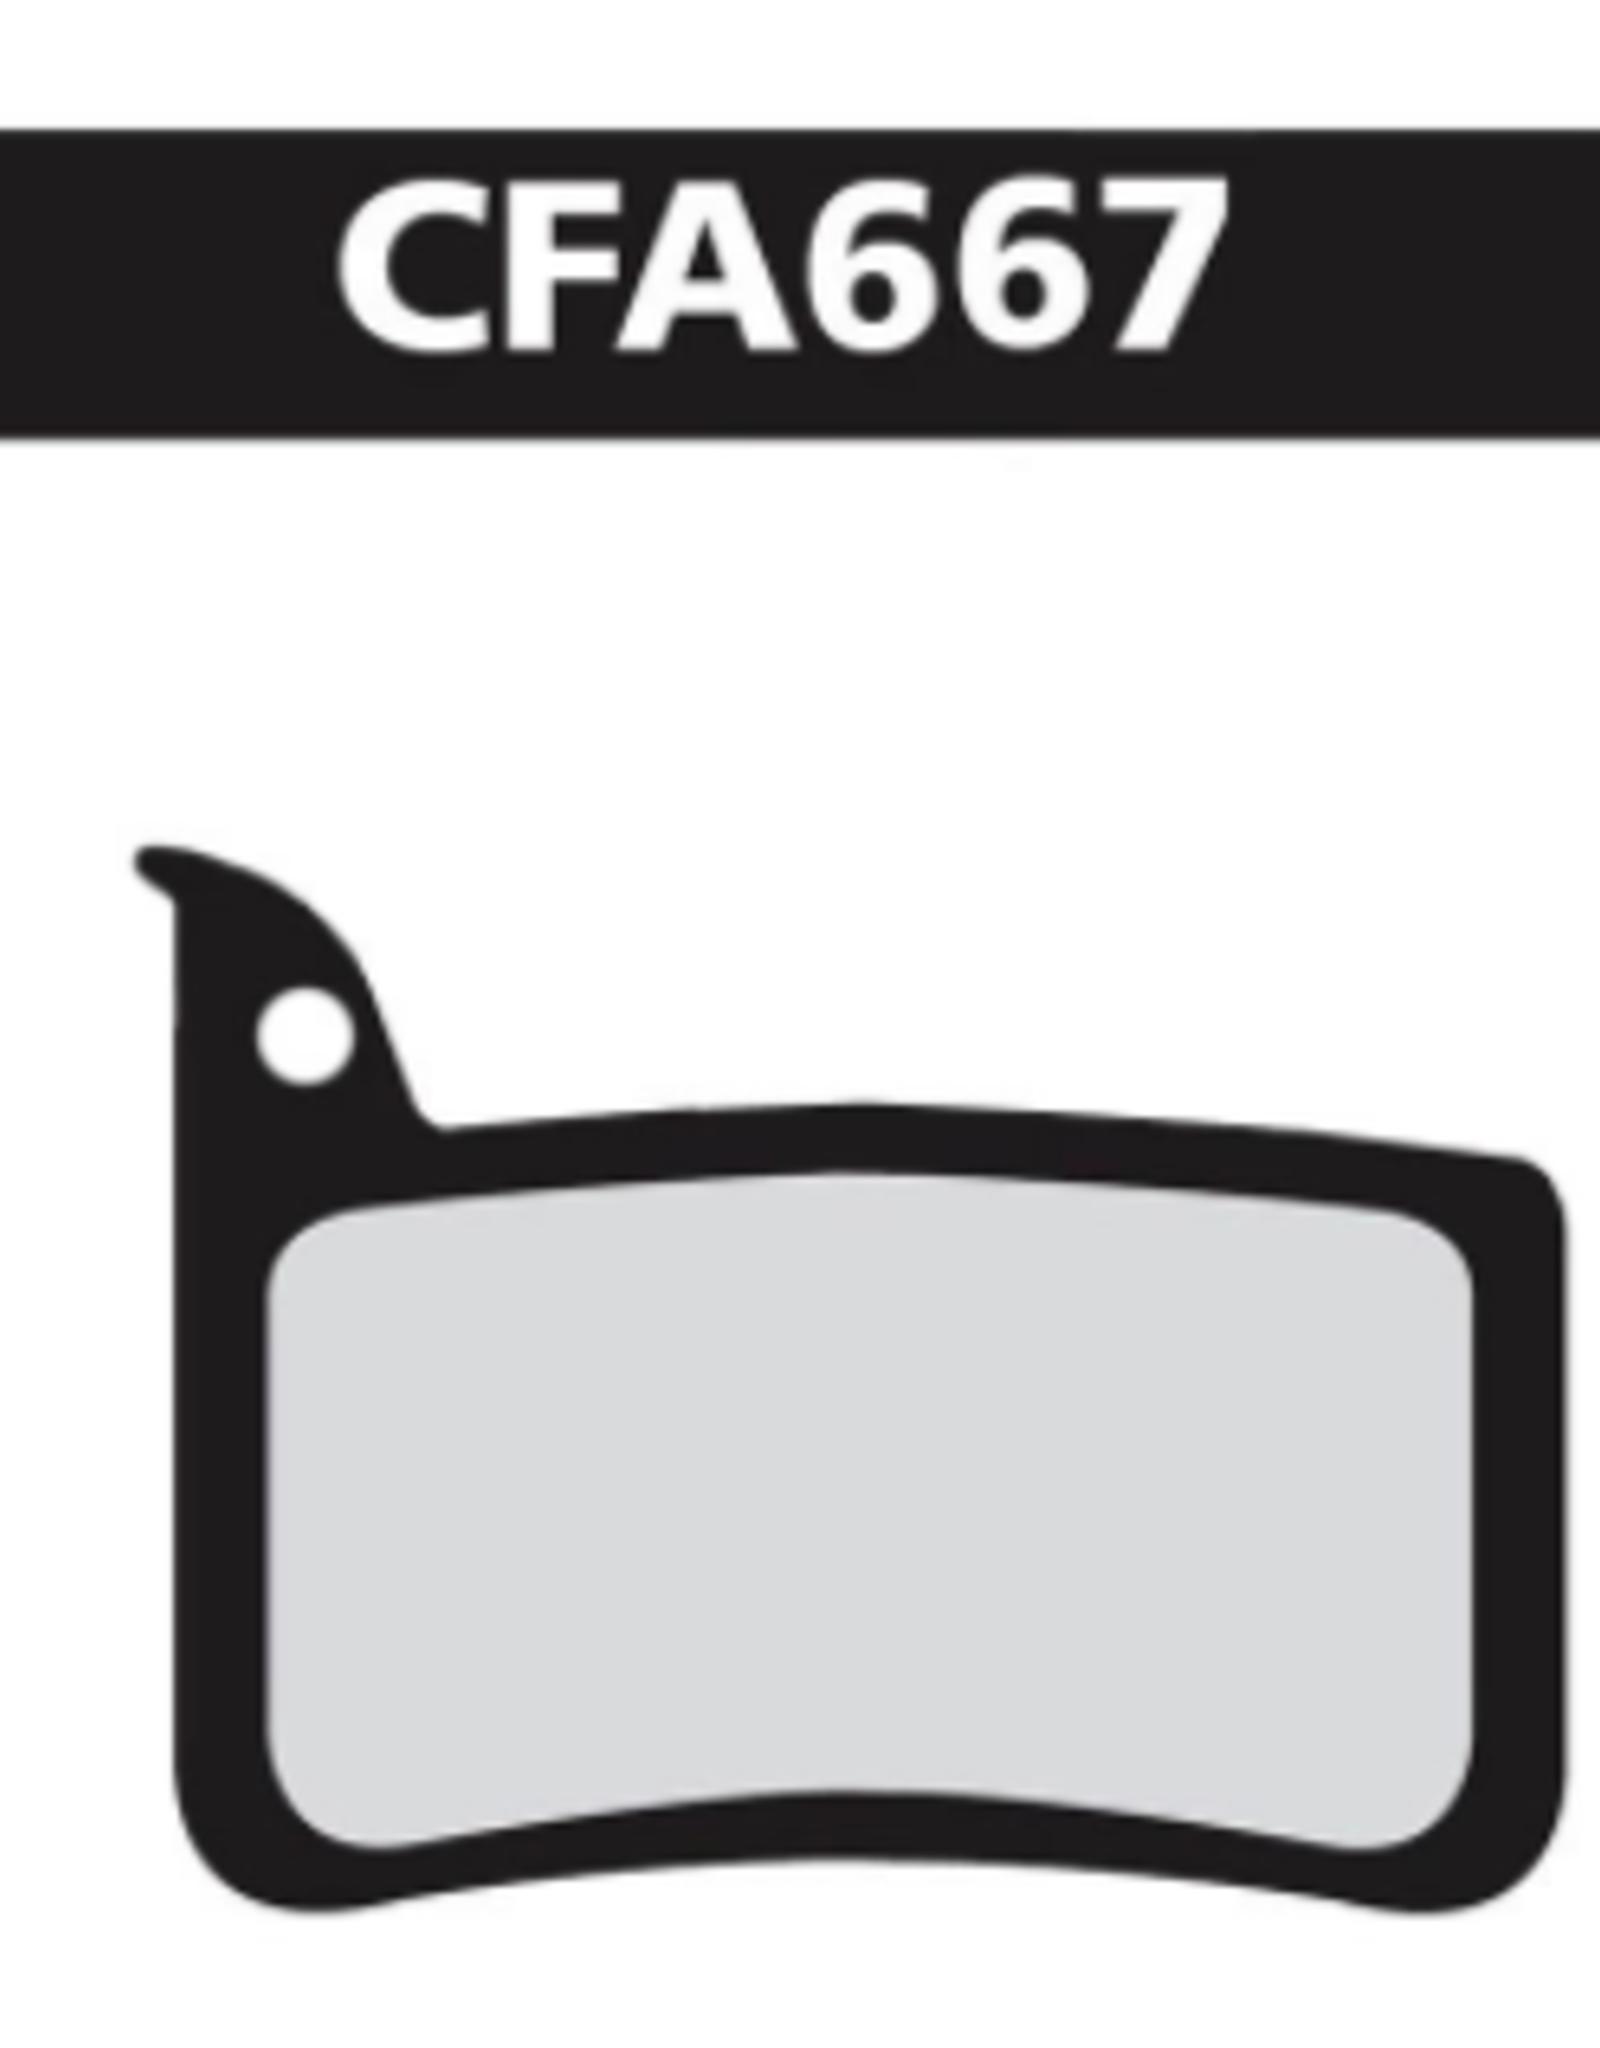 EBC EBC Disc Brake Pads - FA667 Organic (Sram)